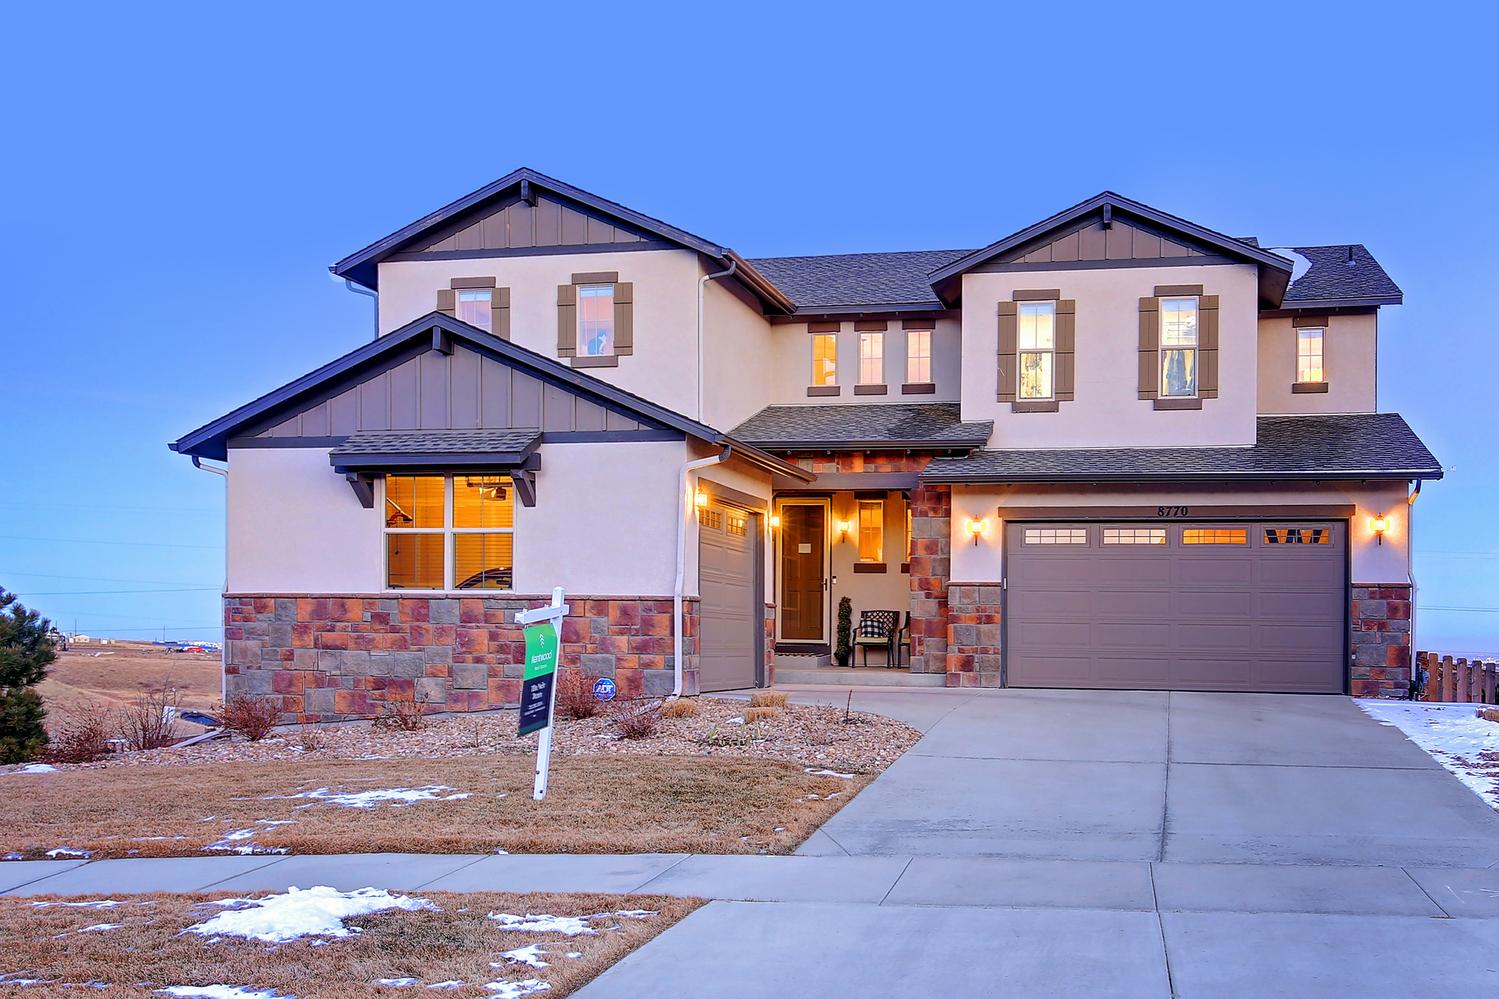 369_1222_property_front-2-1--20210113043229.jpg